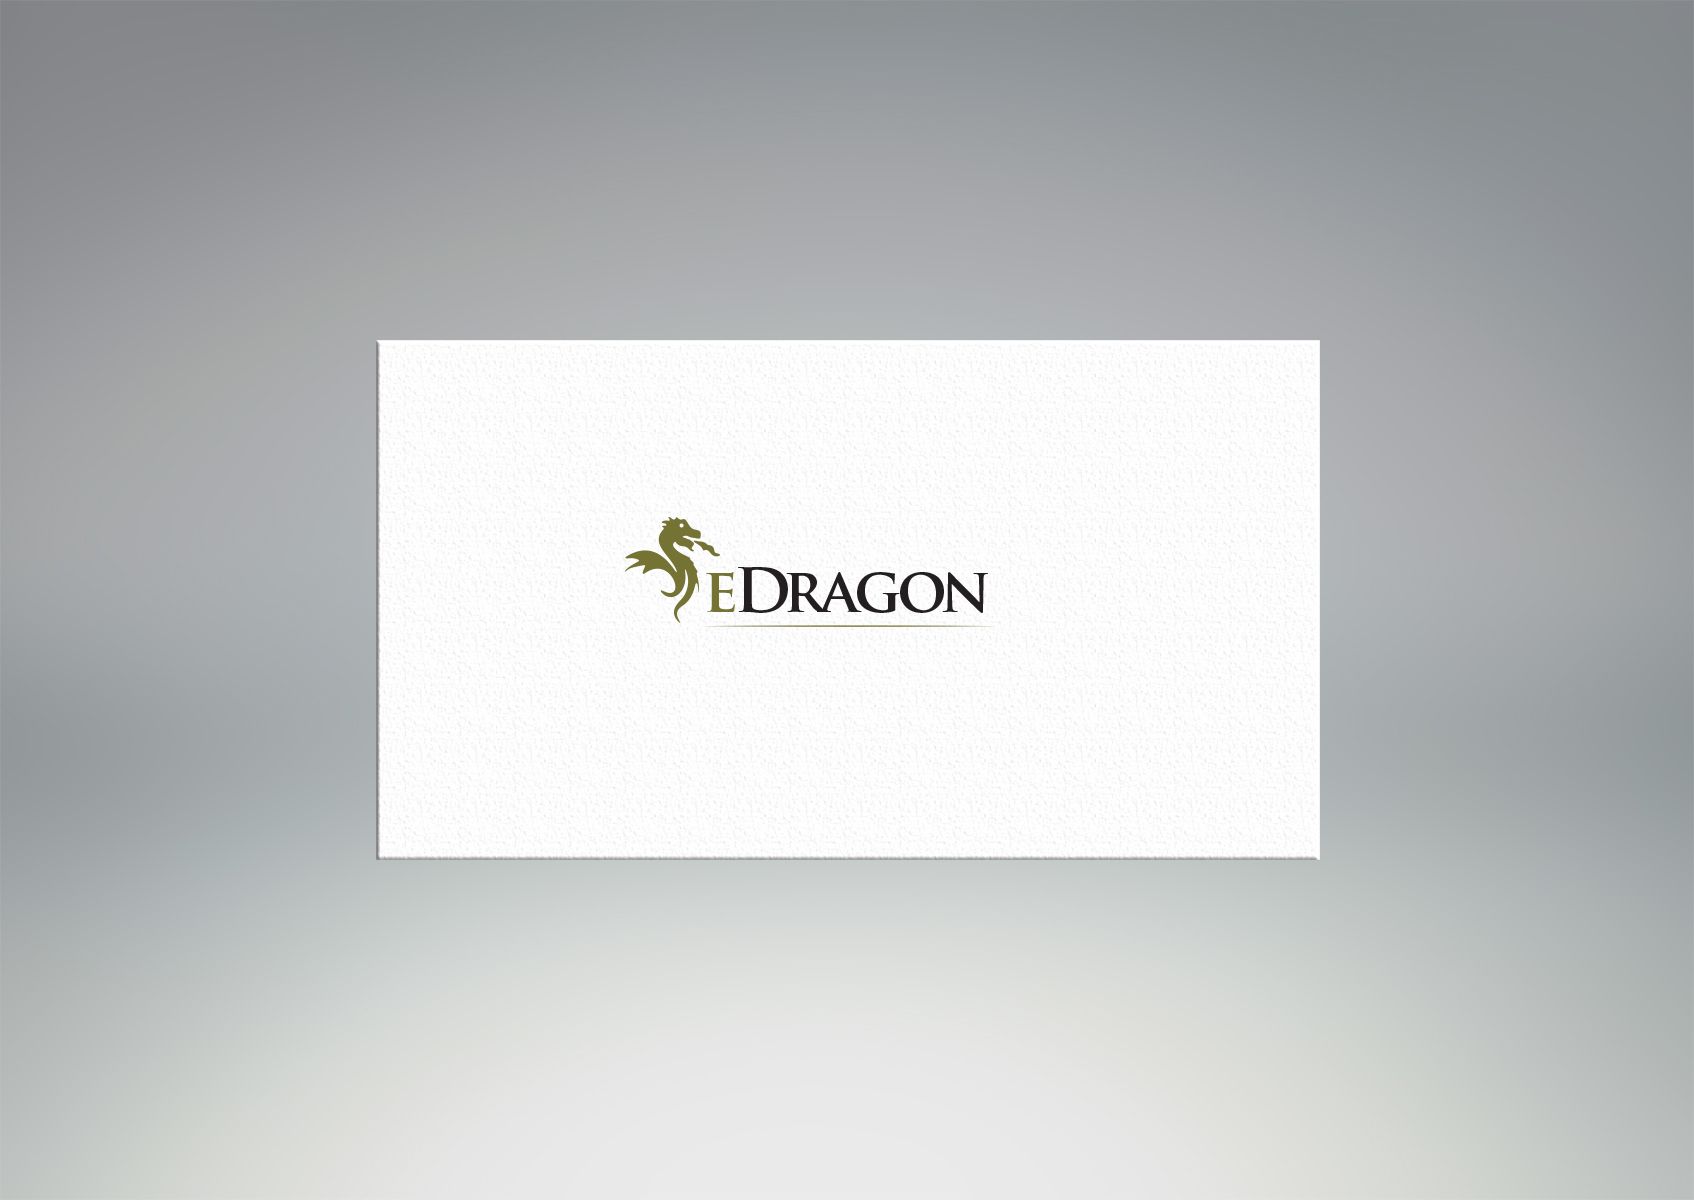 EDRAGON